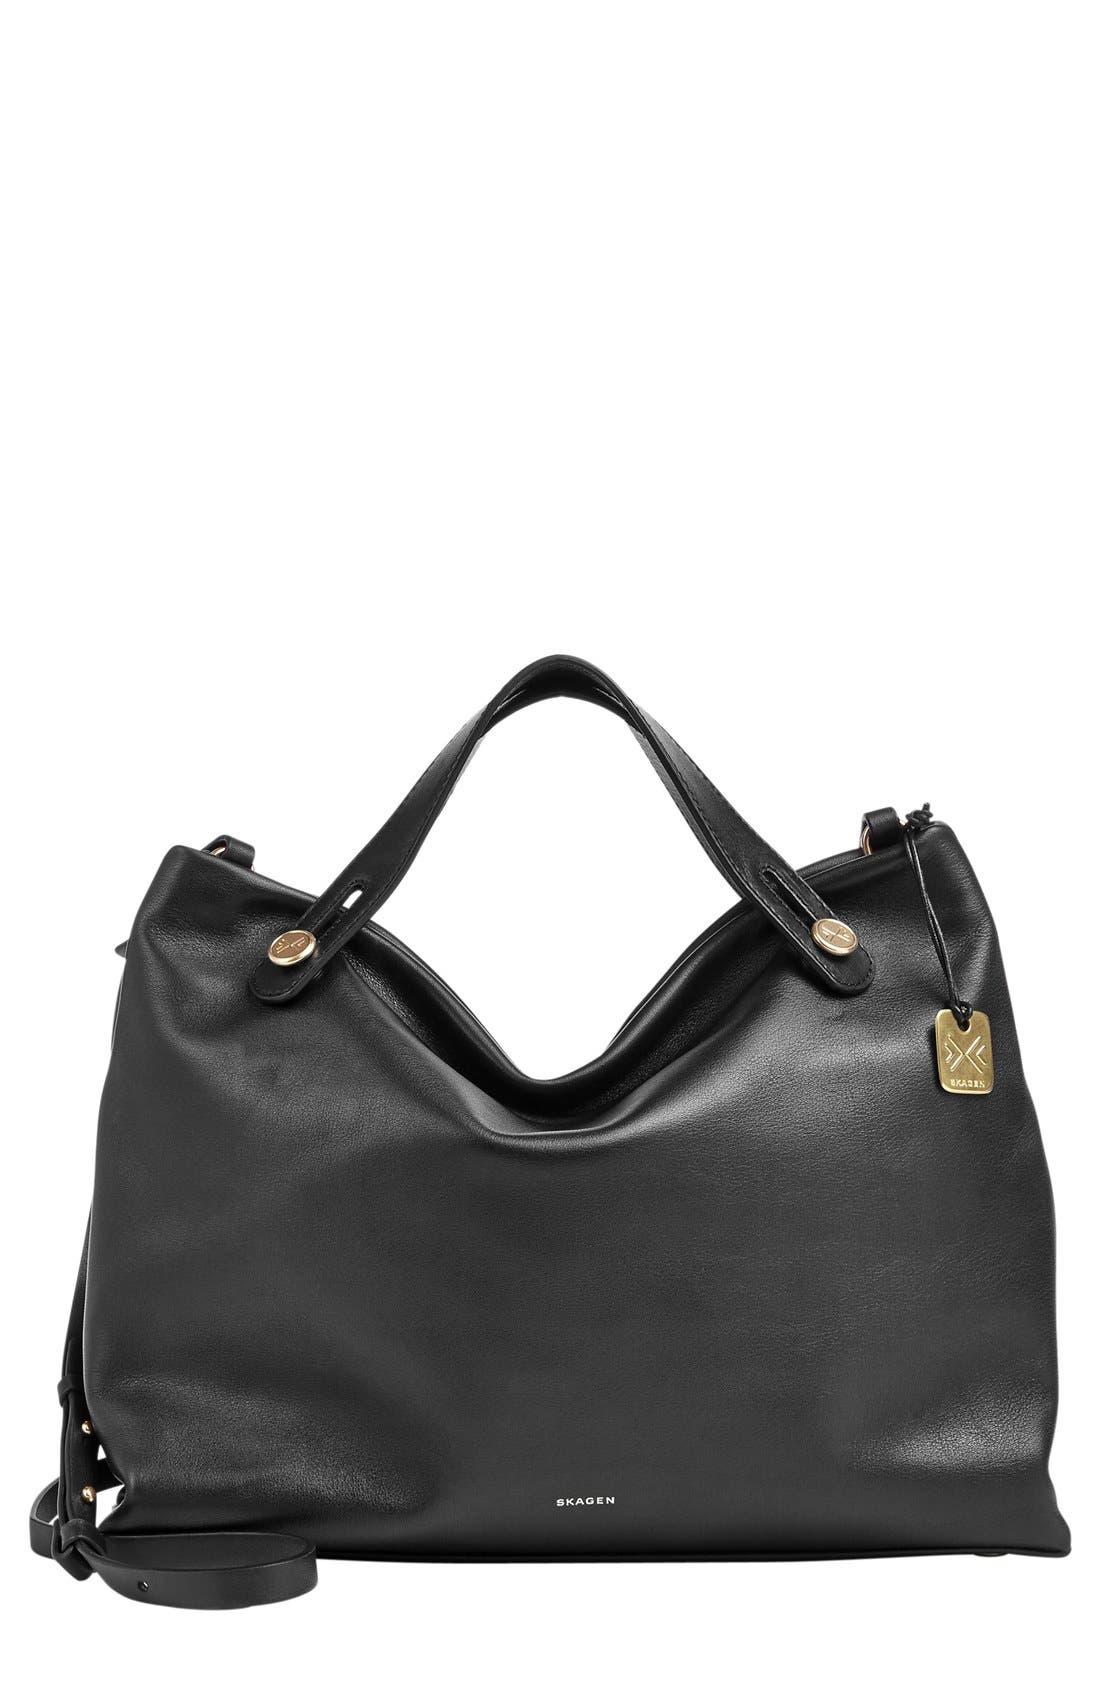 Alternate Image 1 Selected - Skagen 'Mikkeline' Leather Satchel